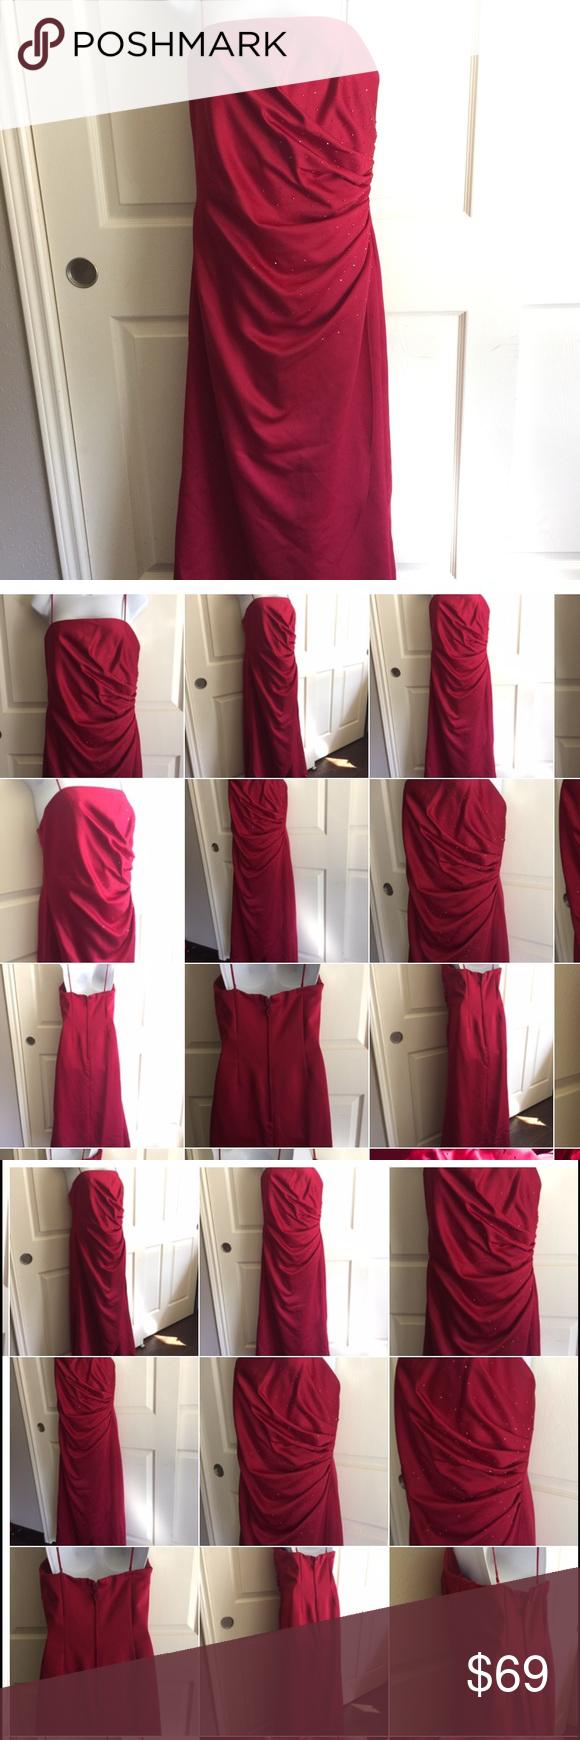 Jordan wedding prom red long dress large